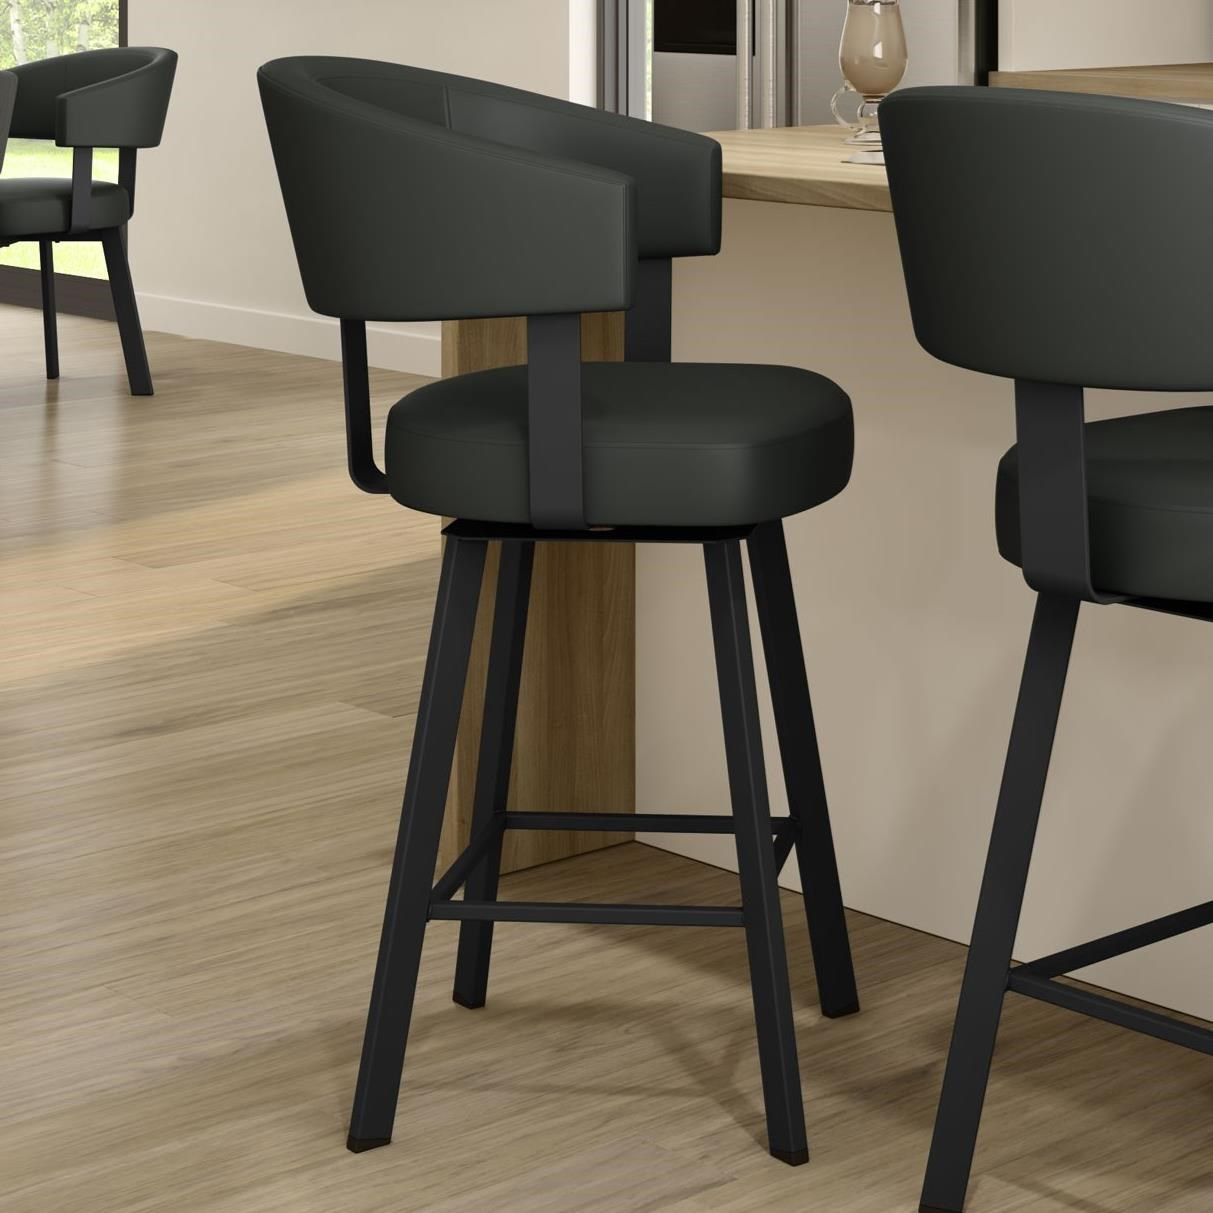 Amisco Nordic 41560 26 25 El Customizable 26 Grissom Swivel Counter Stool Upper Room Home Furnishings Bar Stools